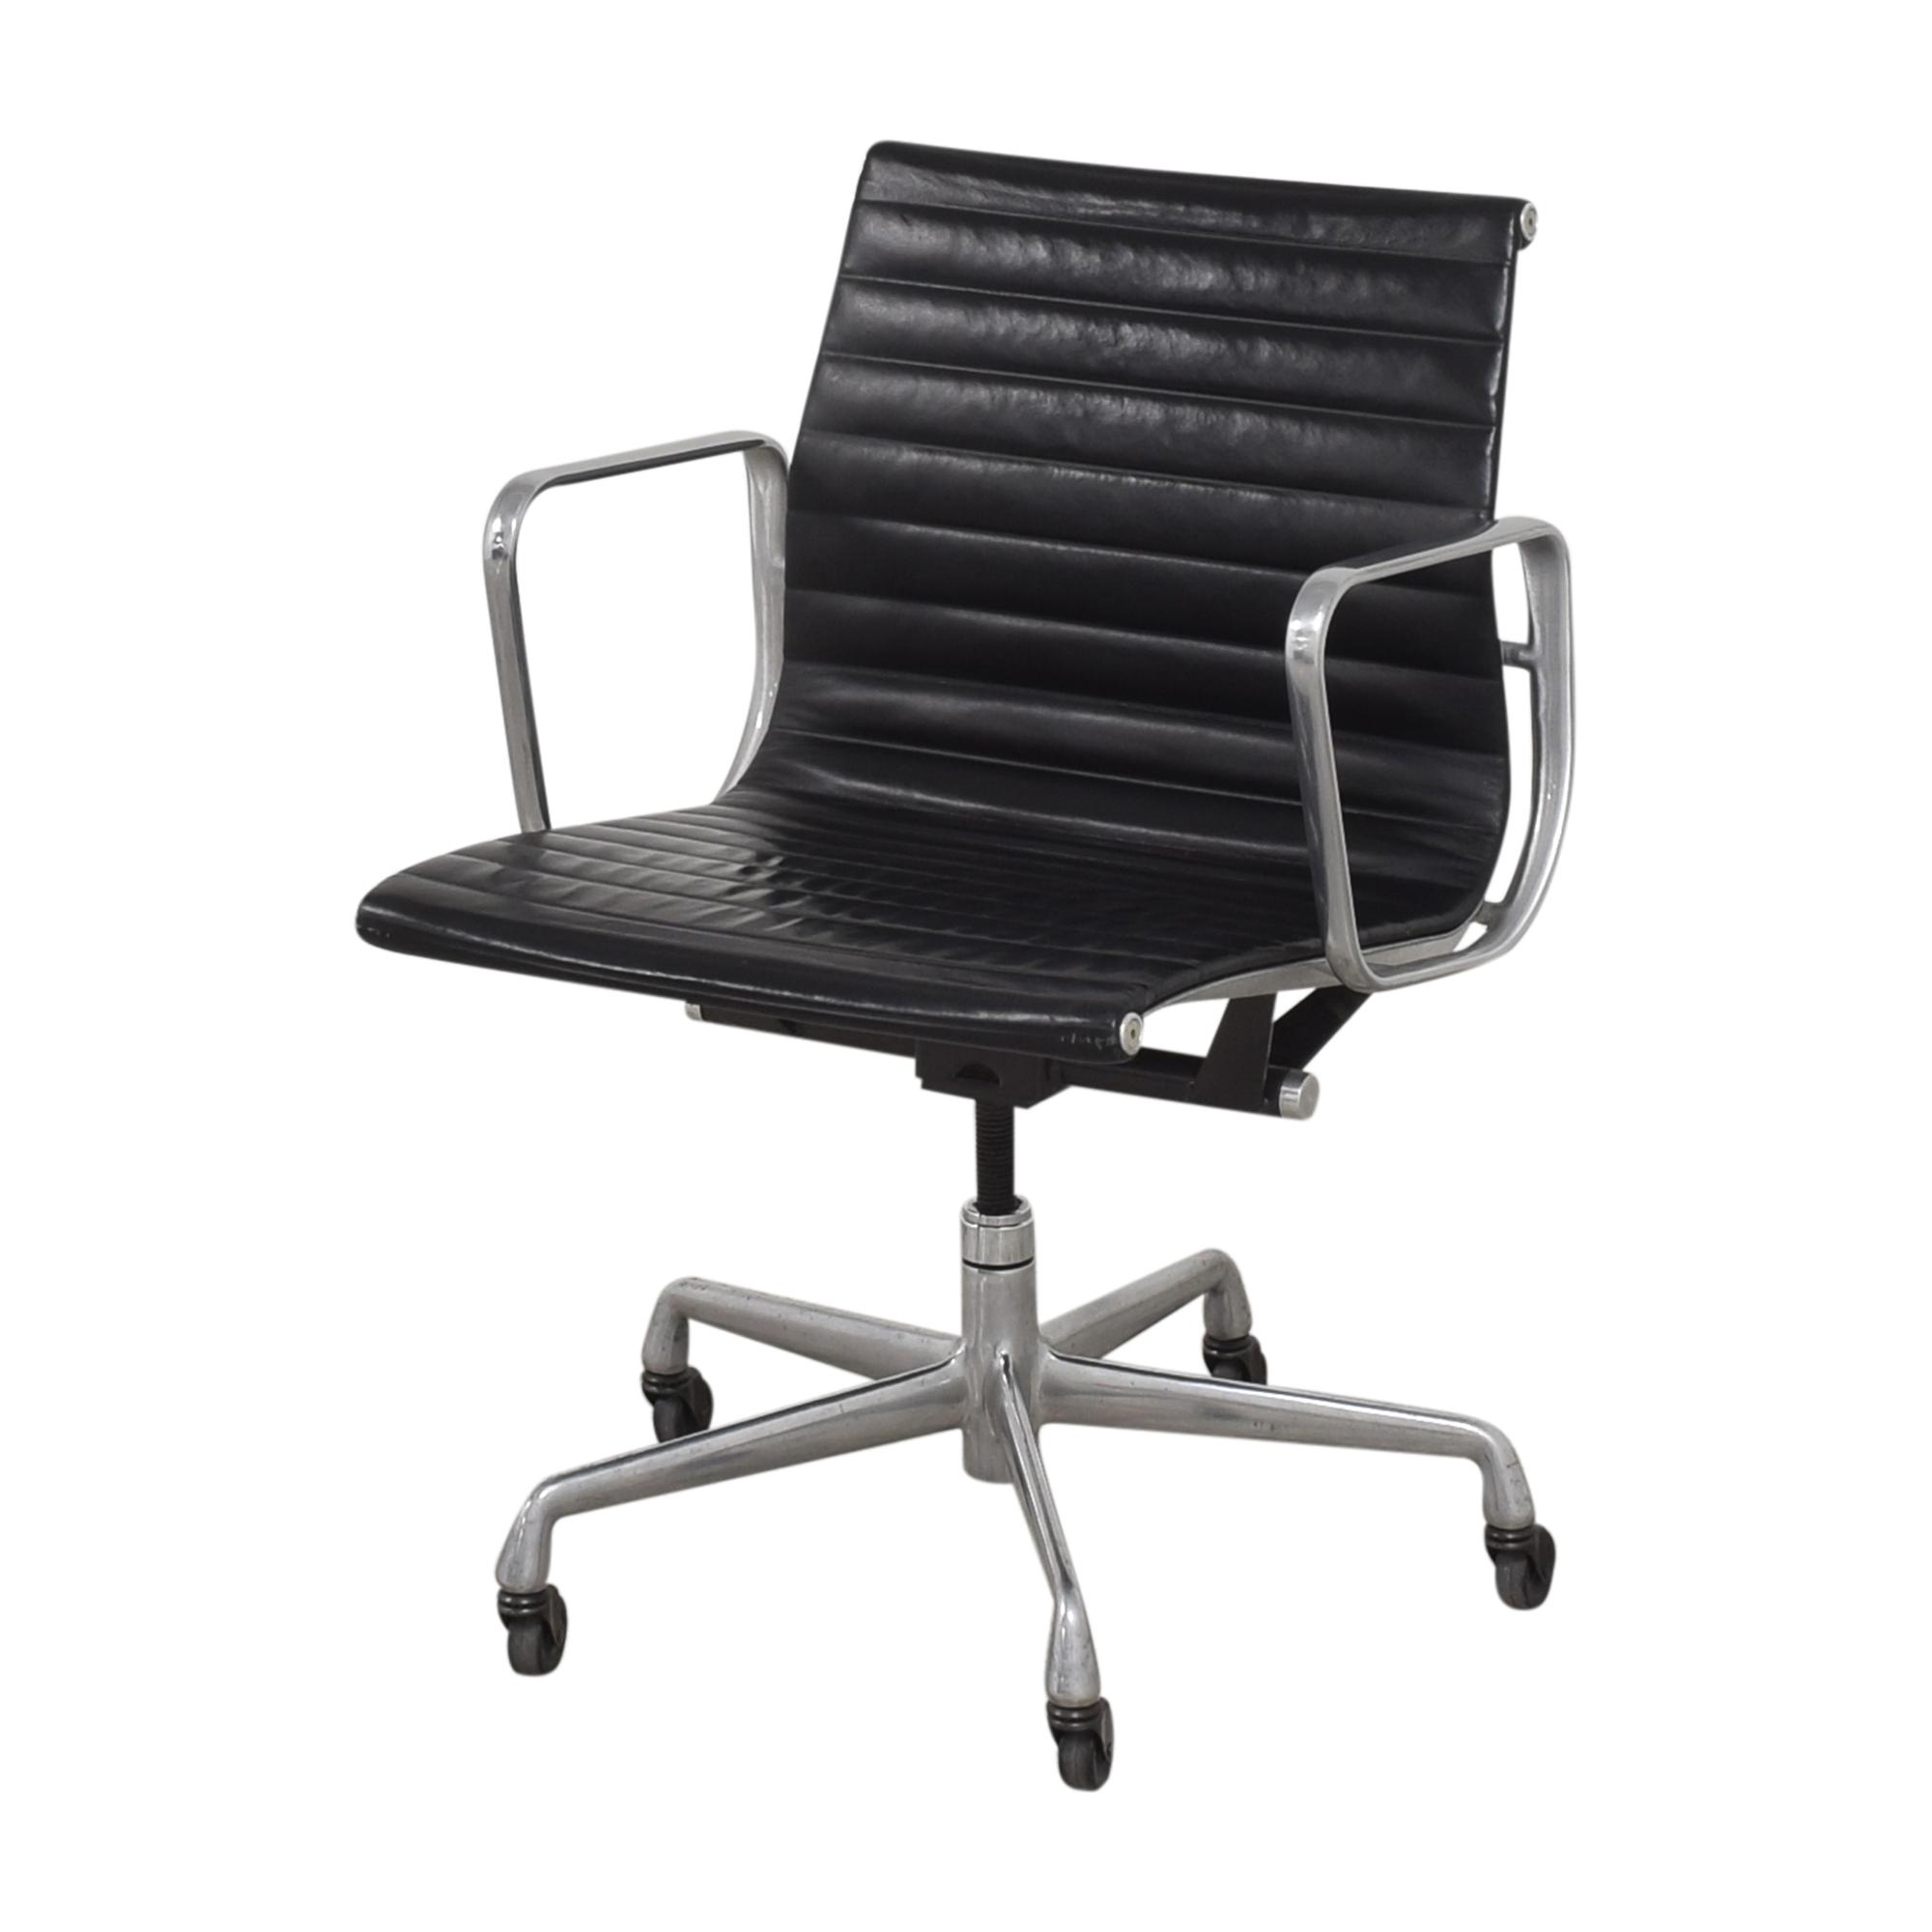 Herman Miller Herman Miller Eames Aluminum Group Management Chair for sale